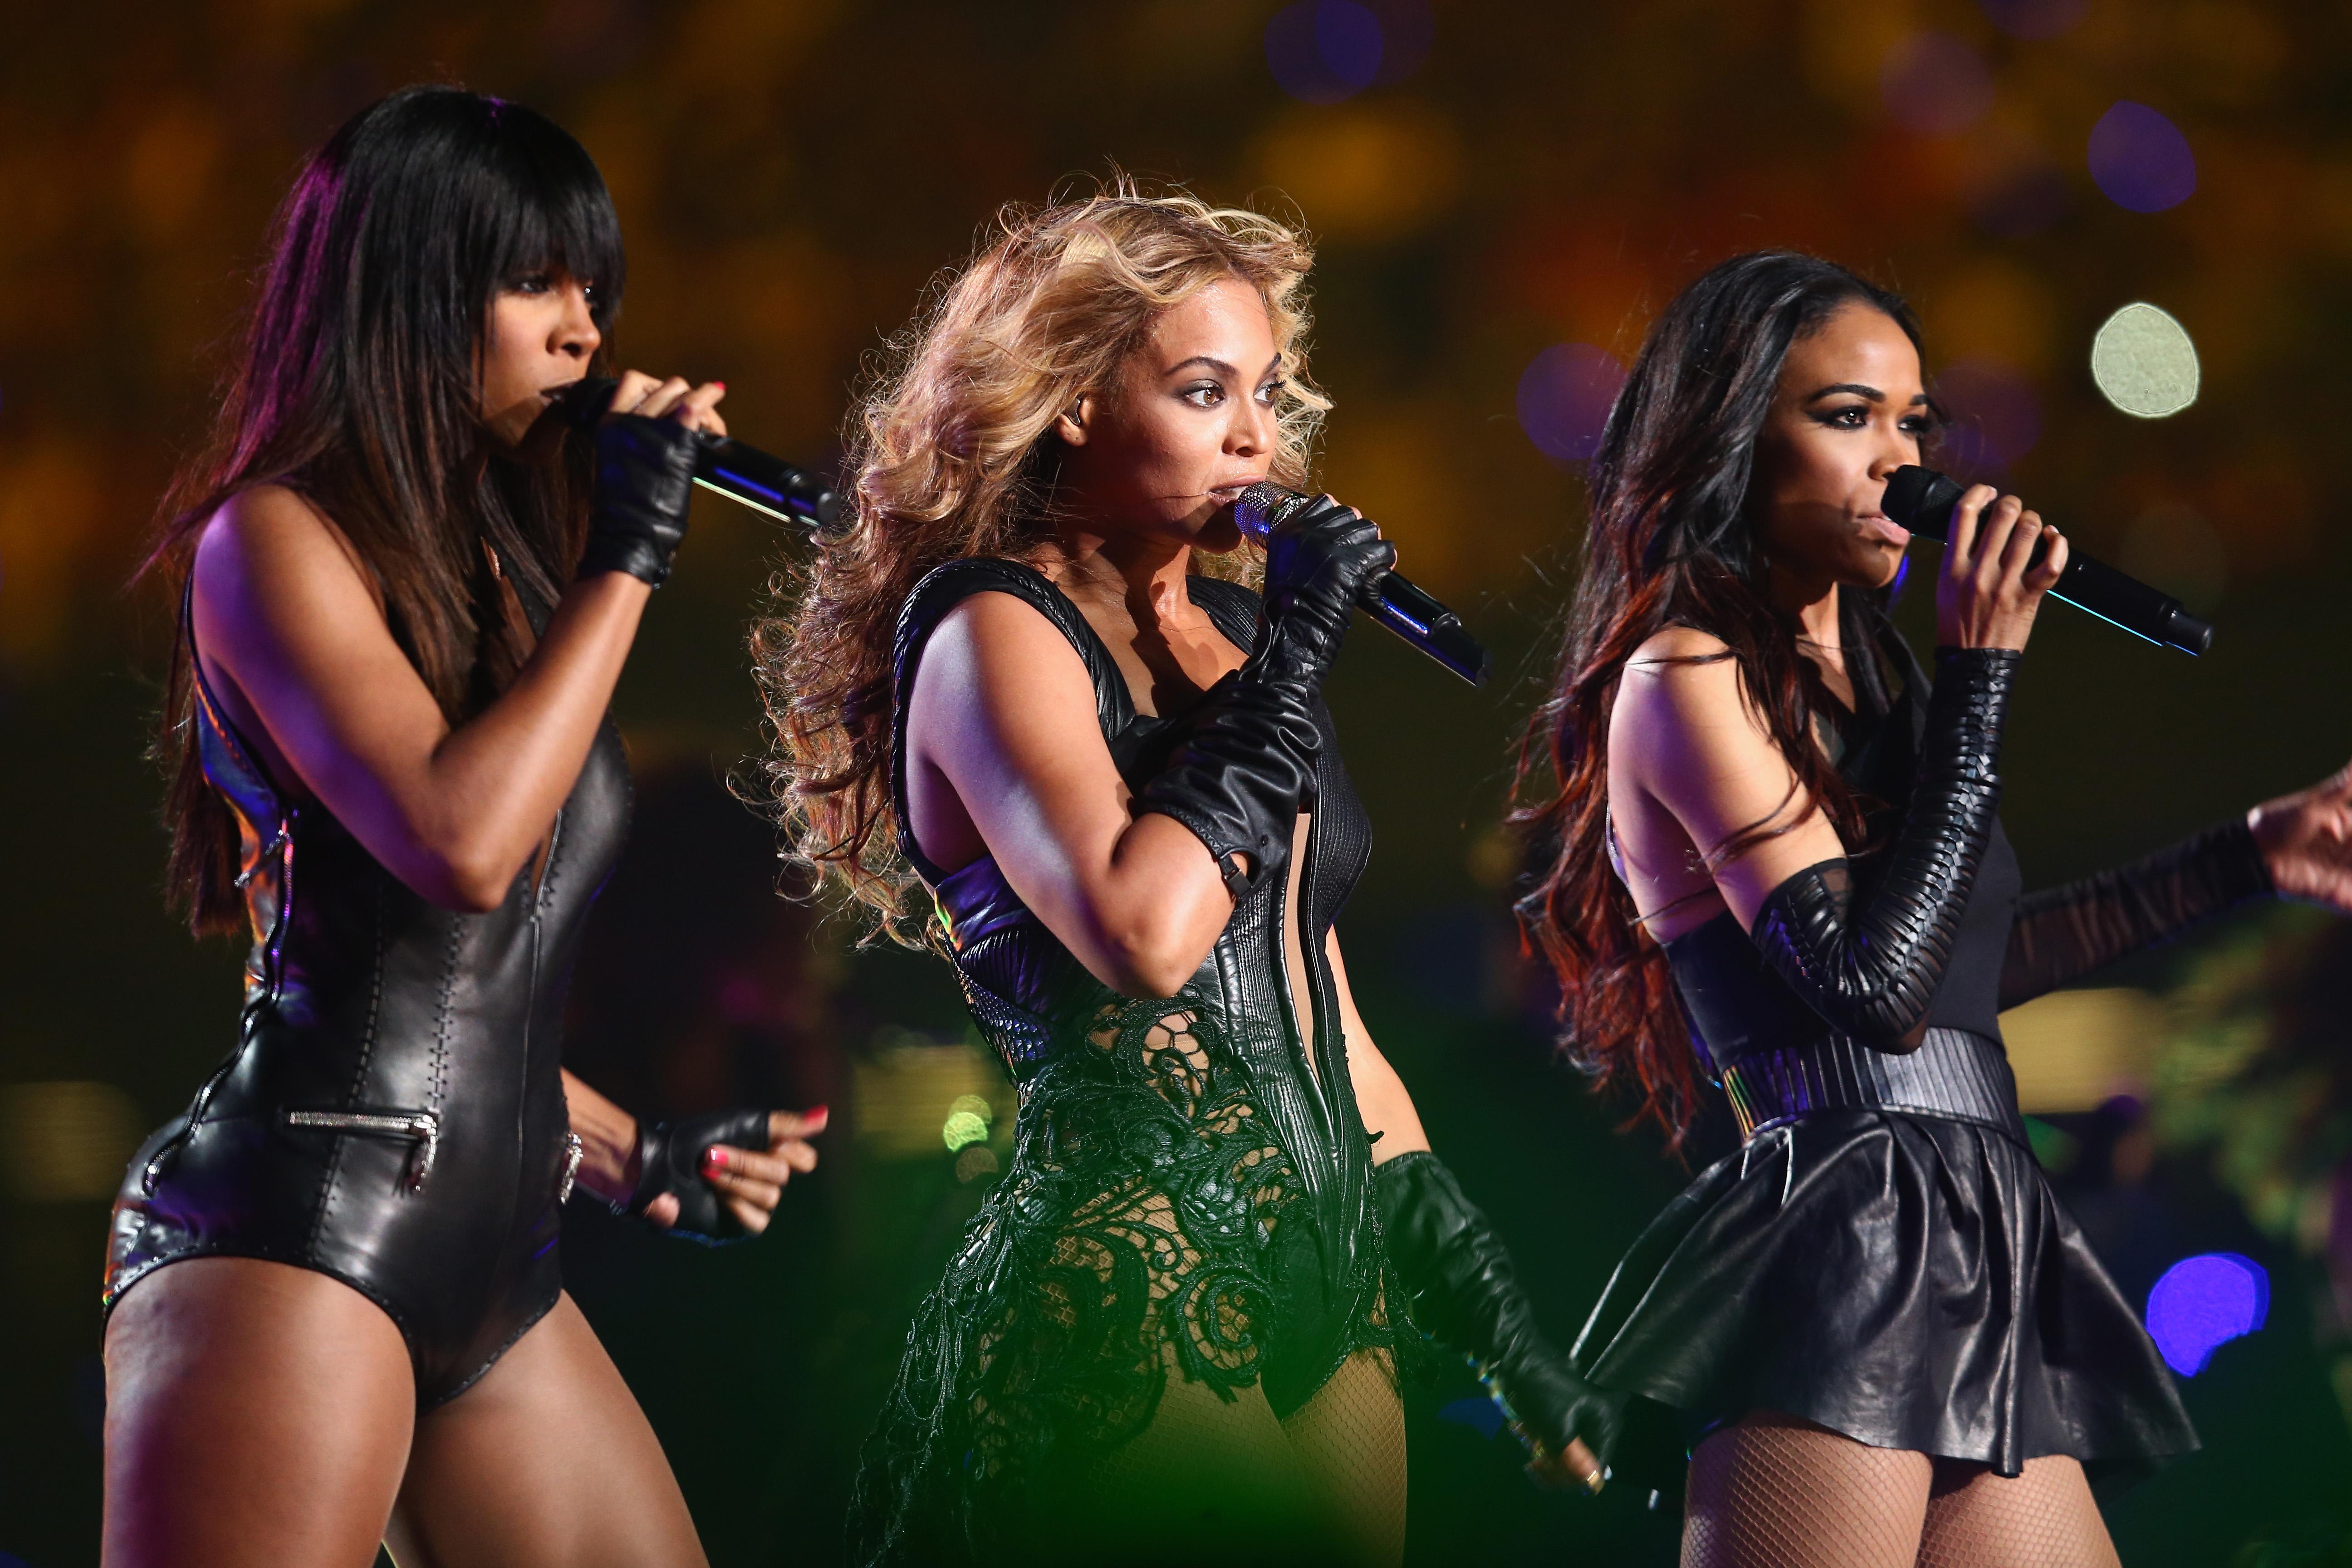 Destiny's Child perform during the Pepsi Super Bow